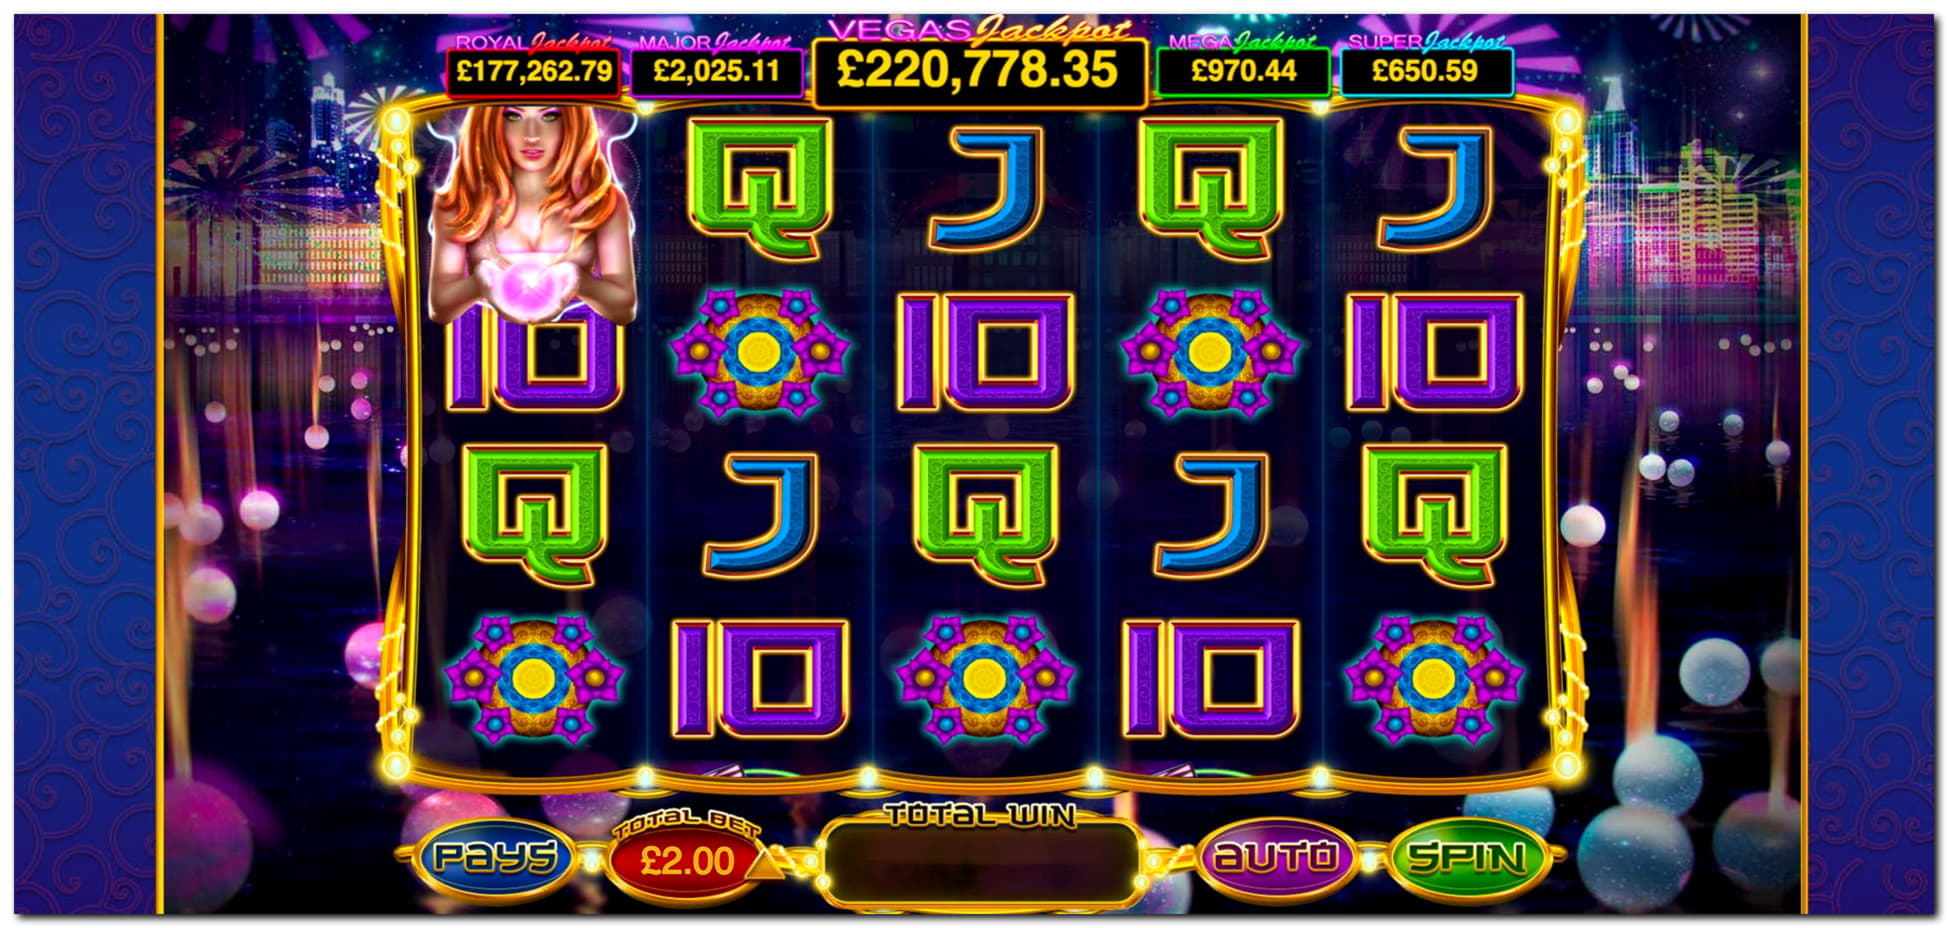 160 free spins no deposit at Slotty Vegas Casino